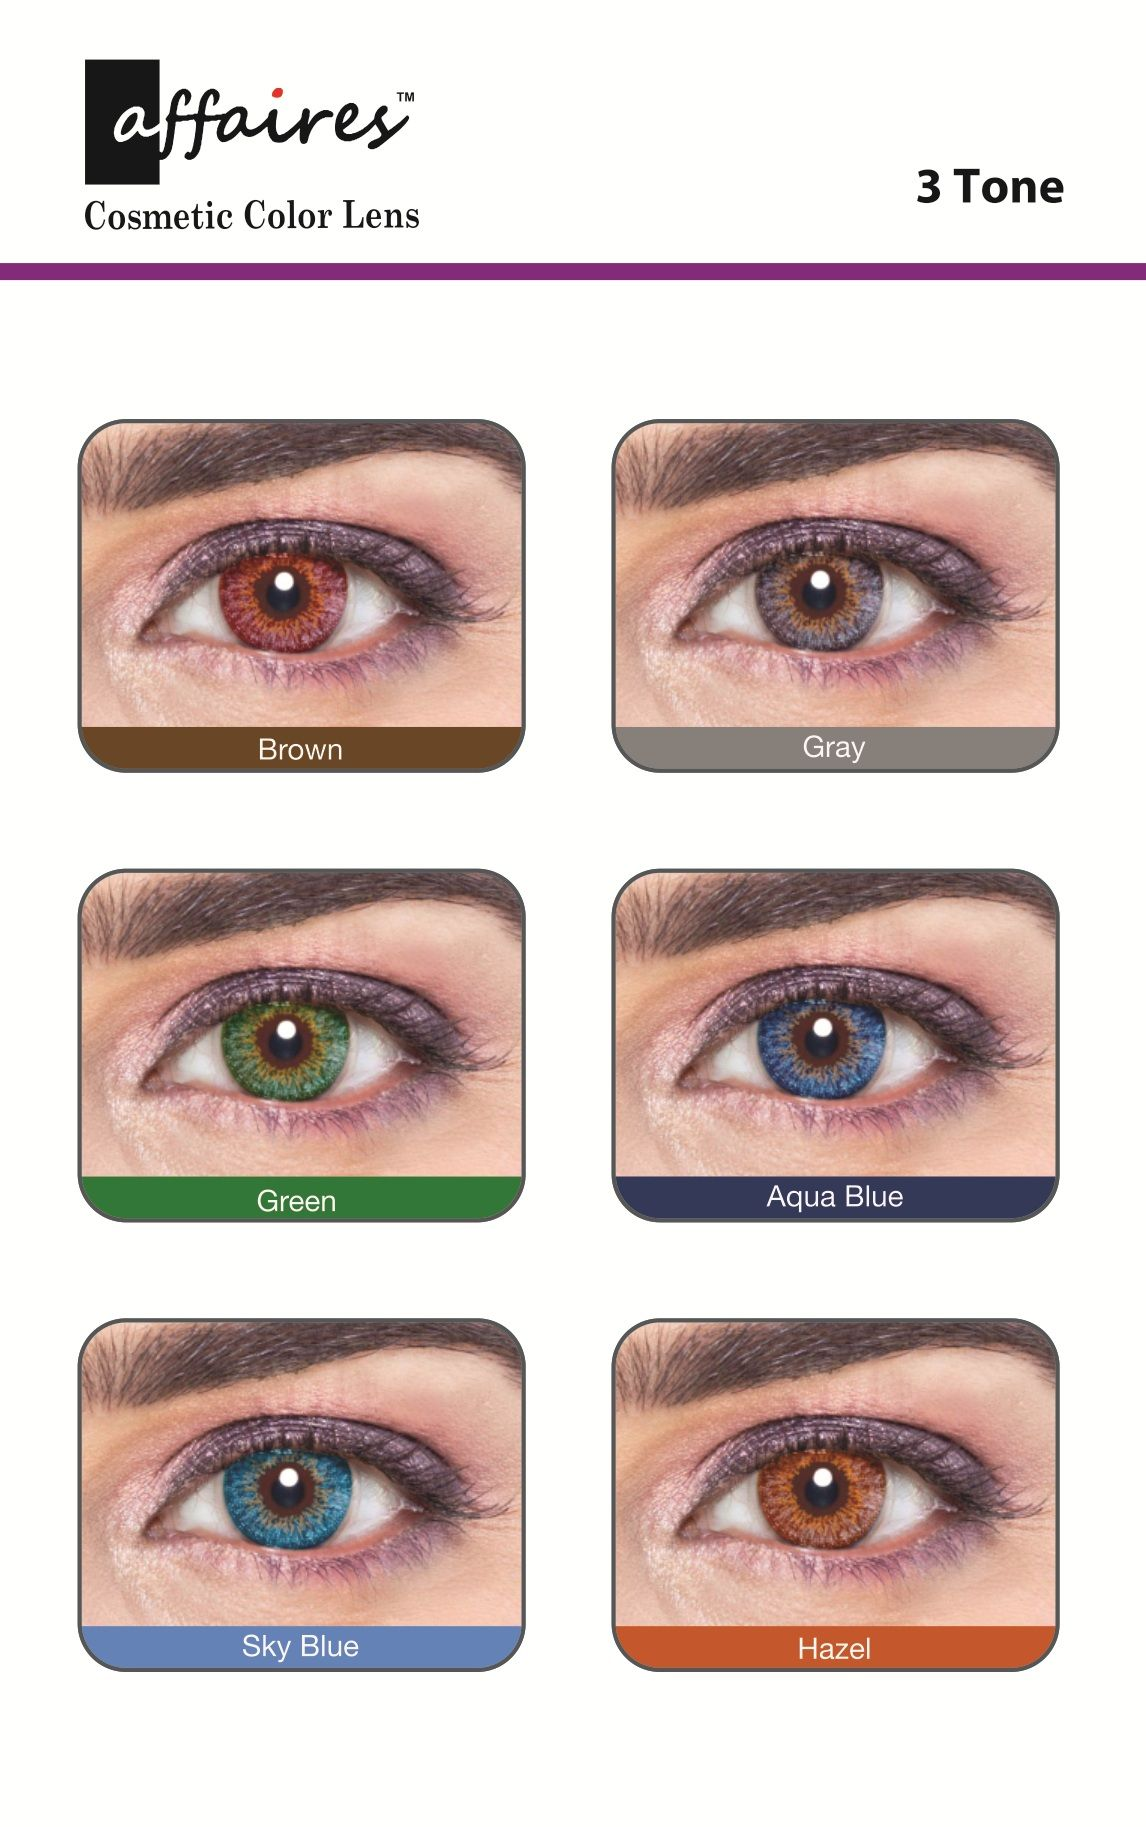 Affaires color contact lenses chart 3 tone affaires color affaires color contact lenses chart 3 tone nvjuhfo Choice Image